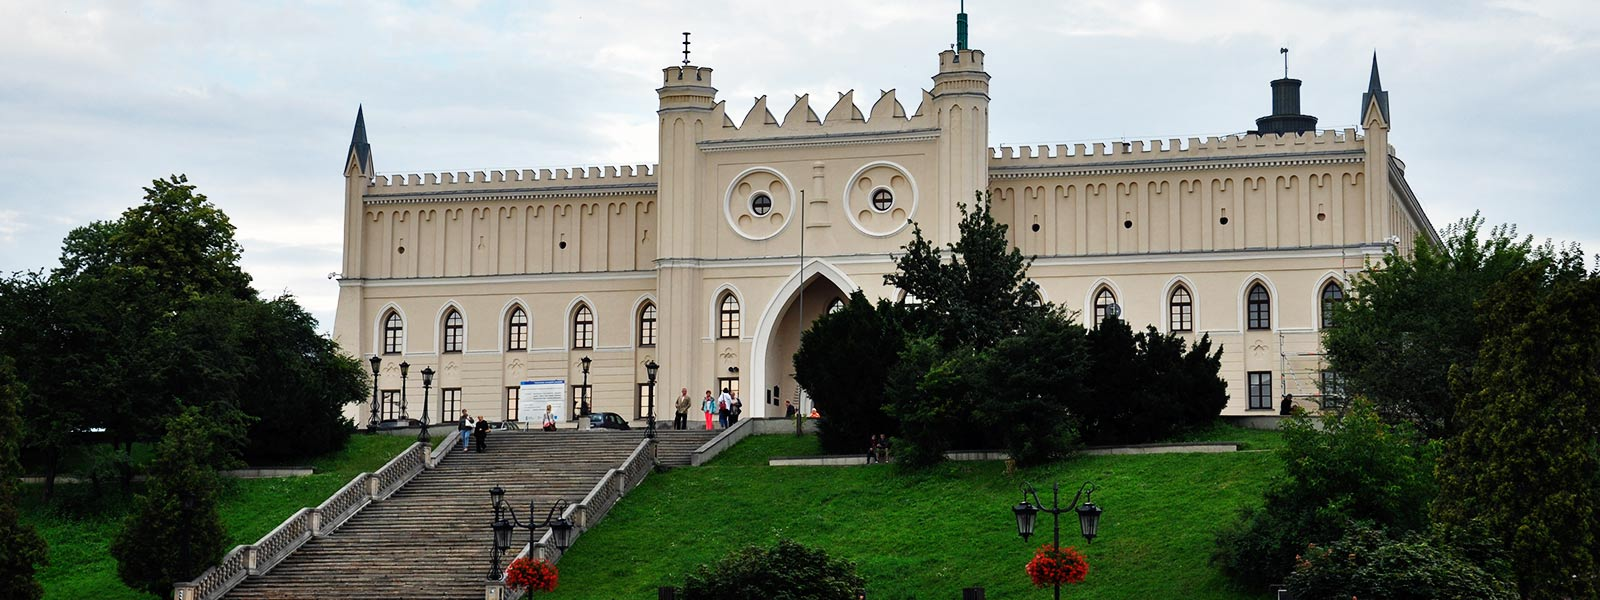 - TNGS Tomasz Karman - Biuro Obsługi Inwestora - Lublin